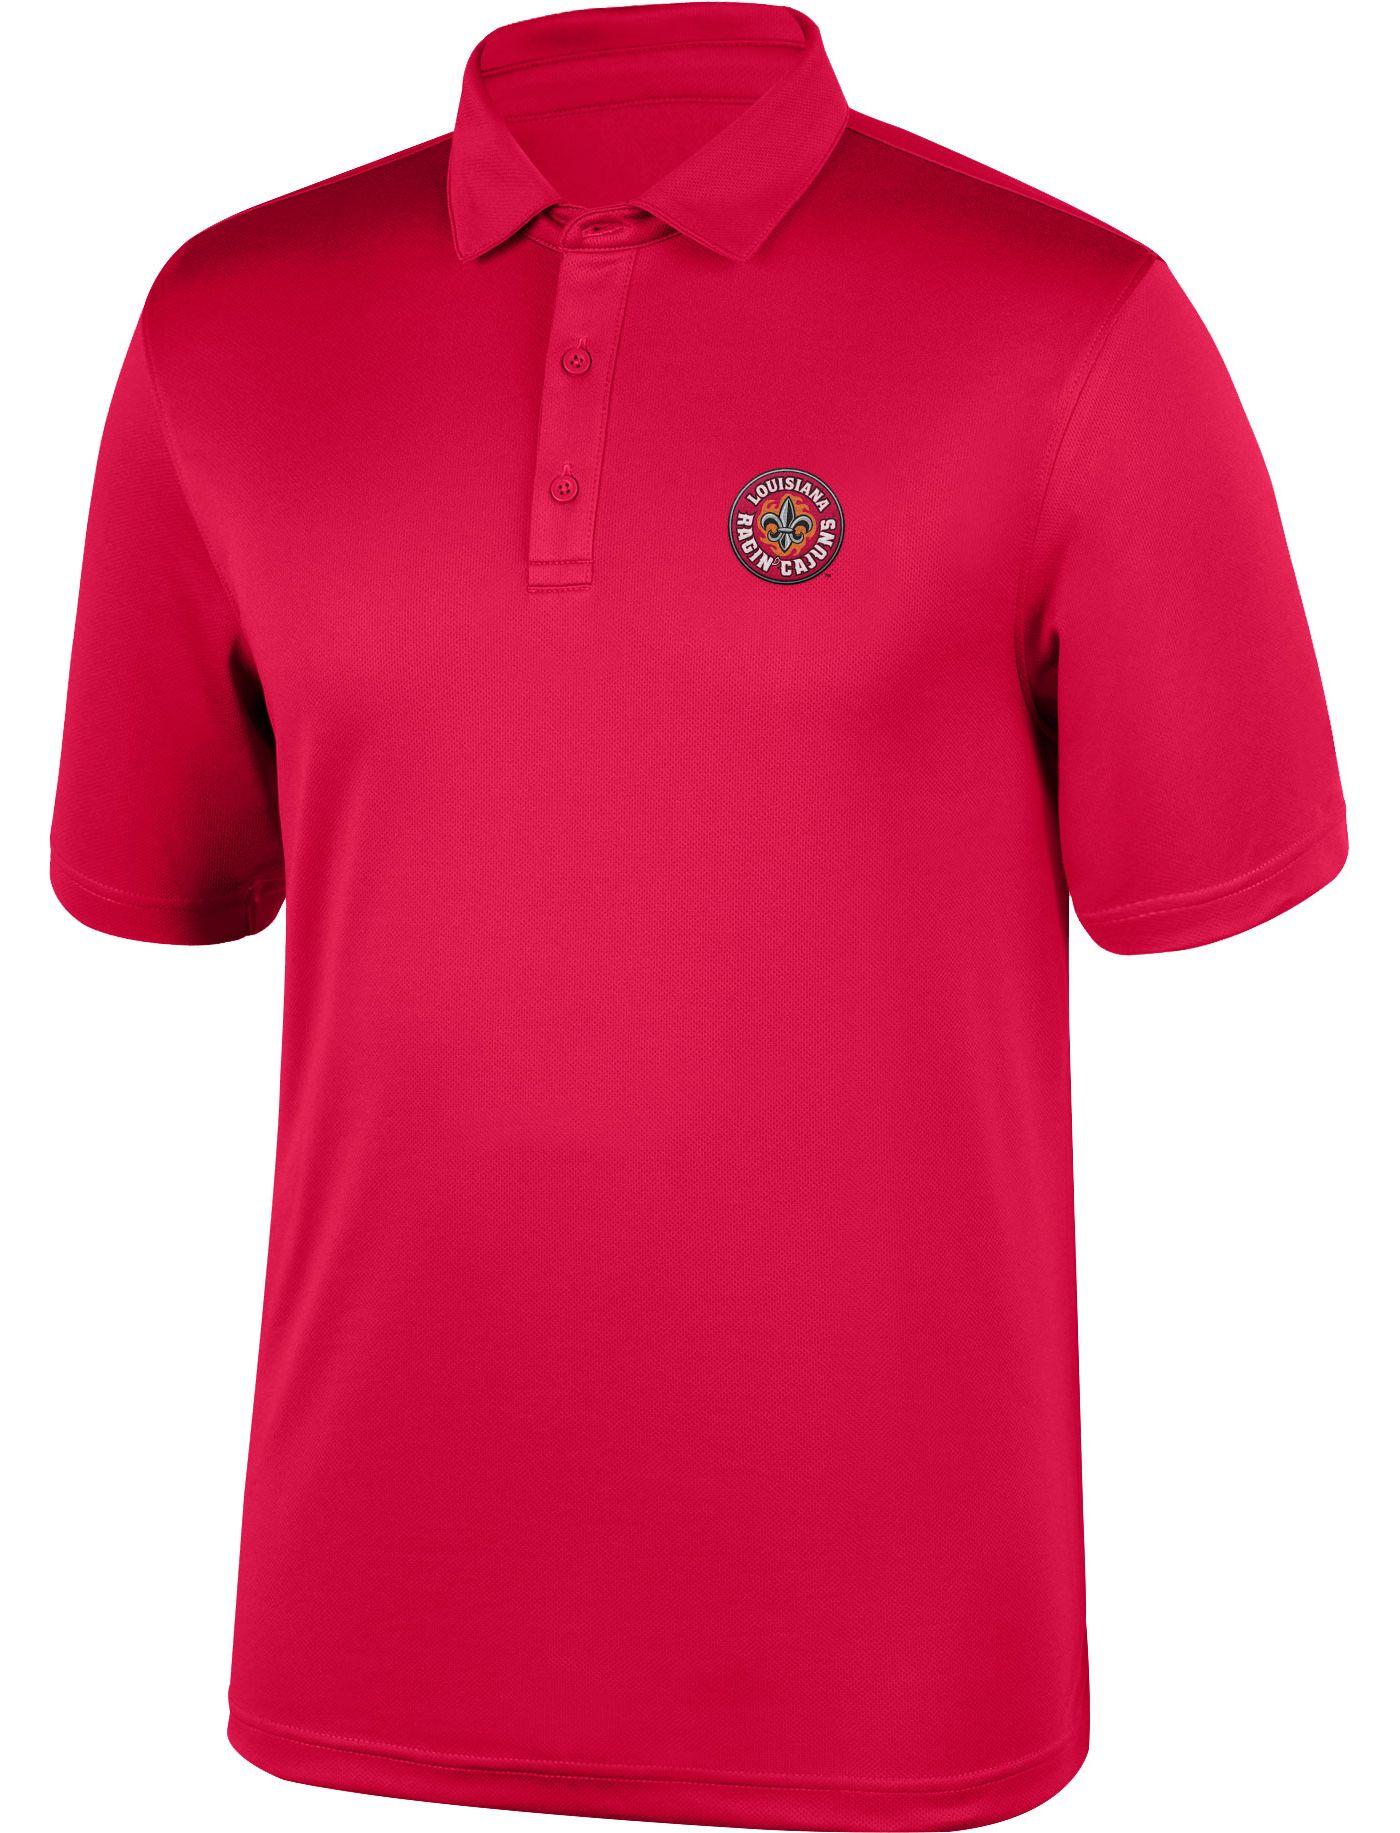 Top of the World Men's Louisiana-Lafayette Ragin' Cajuns Red Polo